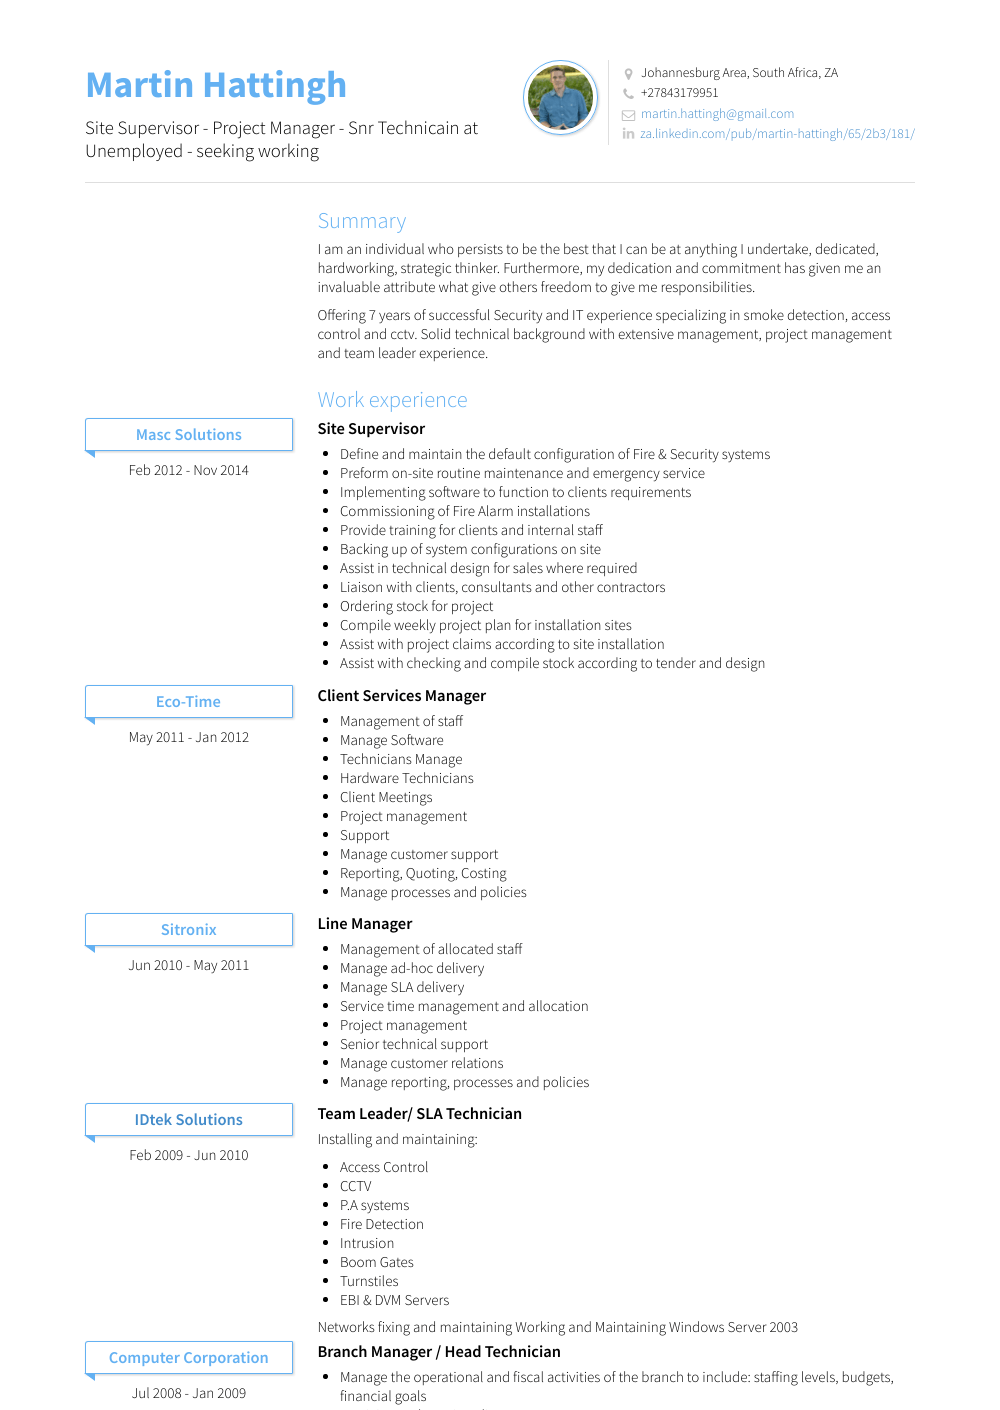 Site Supervisor - Resume Samples & Templates | VisualCV